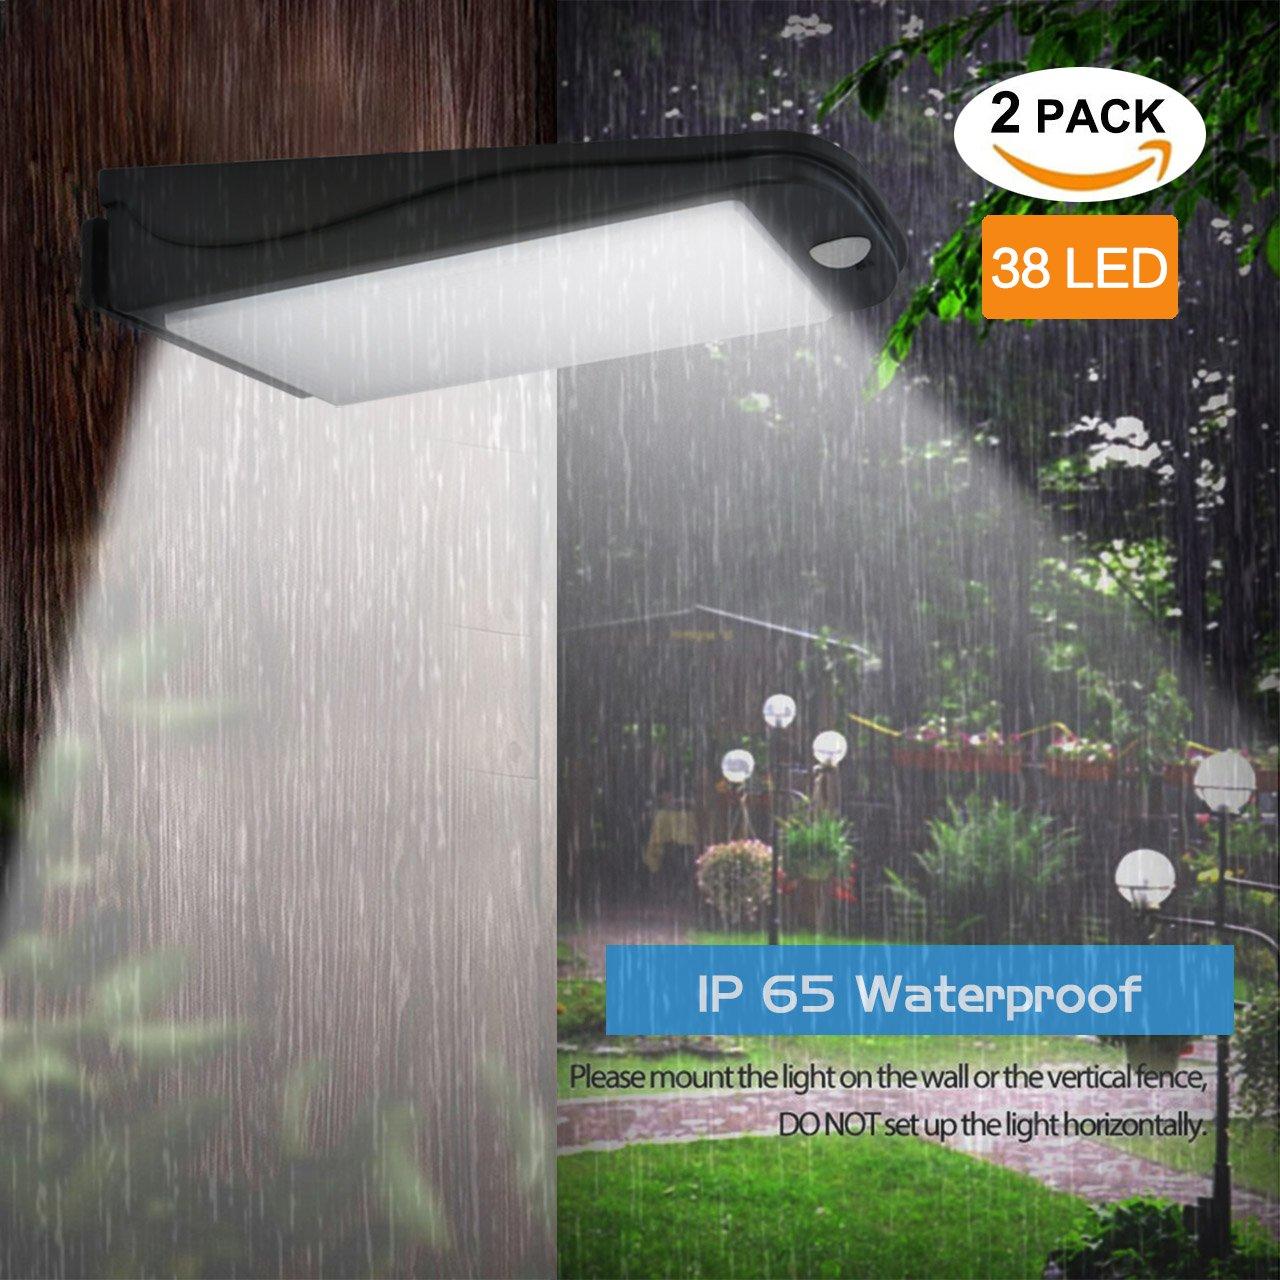 Solar Motion Sensor Lights Outdoor,Aityvert Super Bright 300 Lumen Aluminum Material Spotlight Waterproof Wireless Security Wall Light for Garden,Patio,Deck,Yard,Driveway (2 Pack)